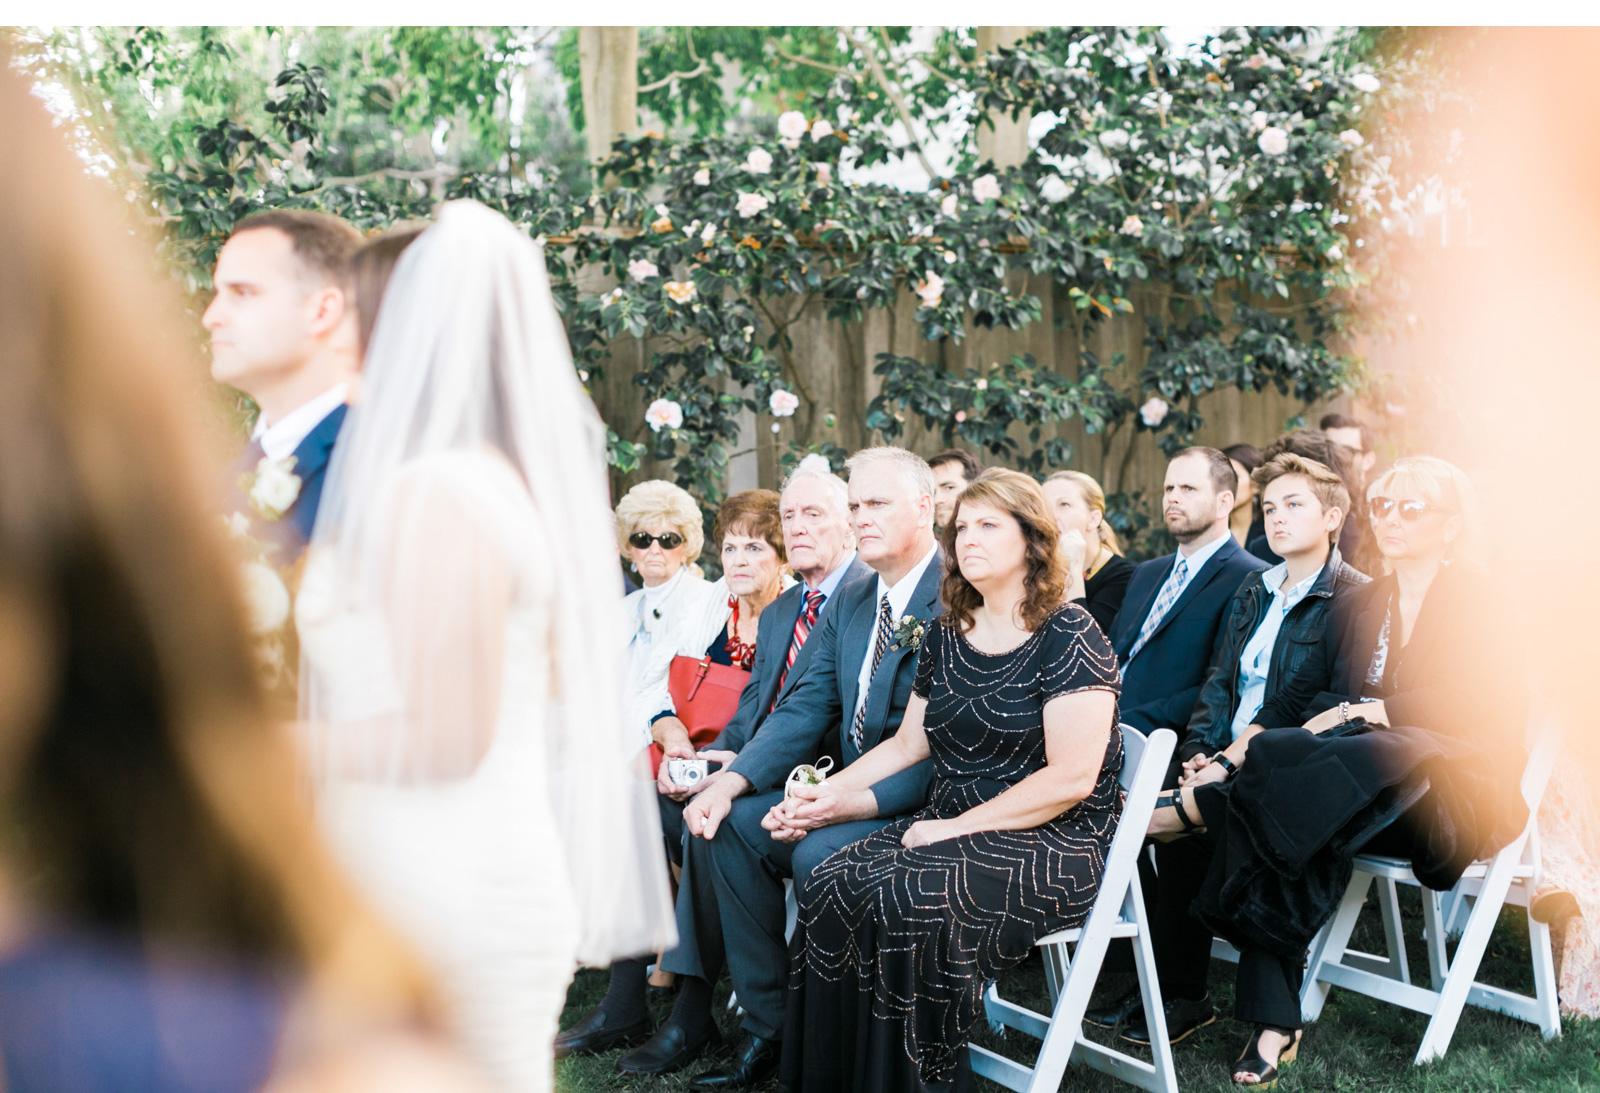 Jon-&-Amanda's-Backyard-Manhattan-Beach-Wedding_07.jpg